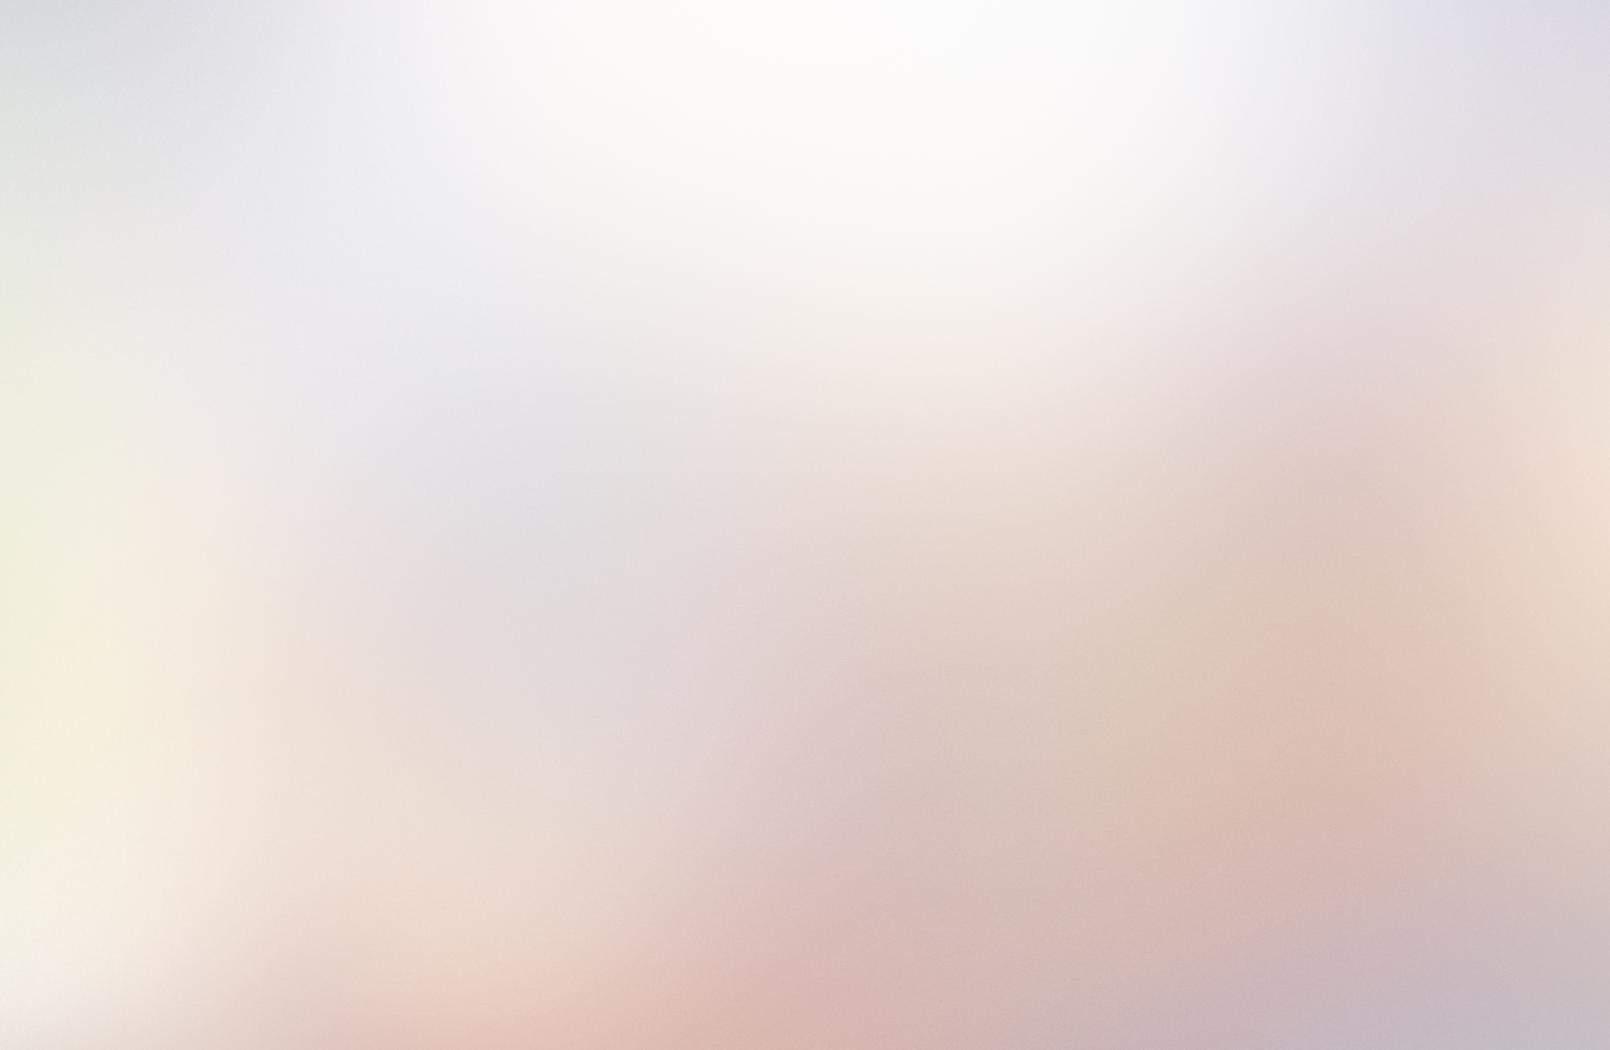 IOS毛玻璃PPT背景图片的第1张封面图片